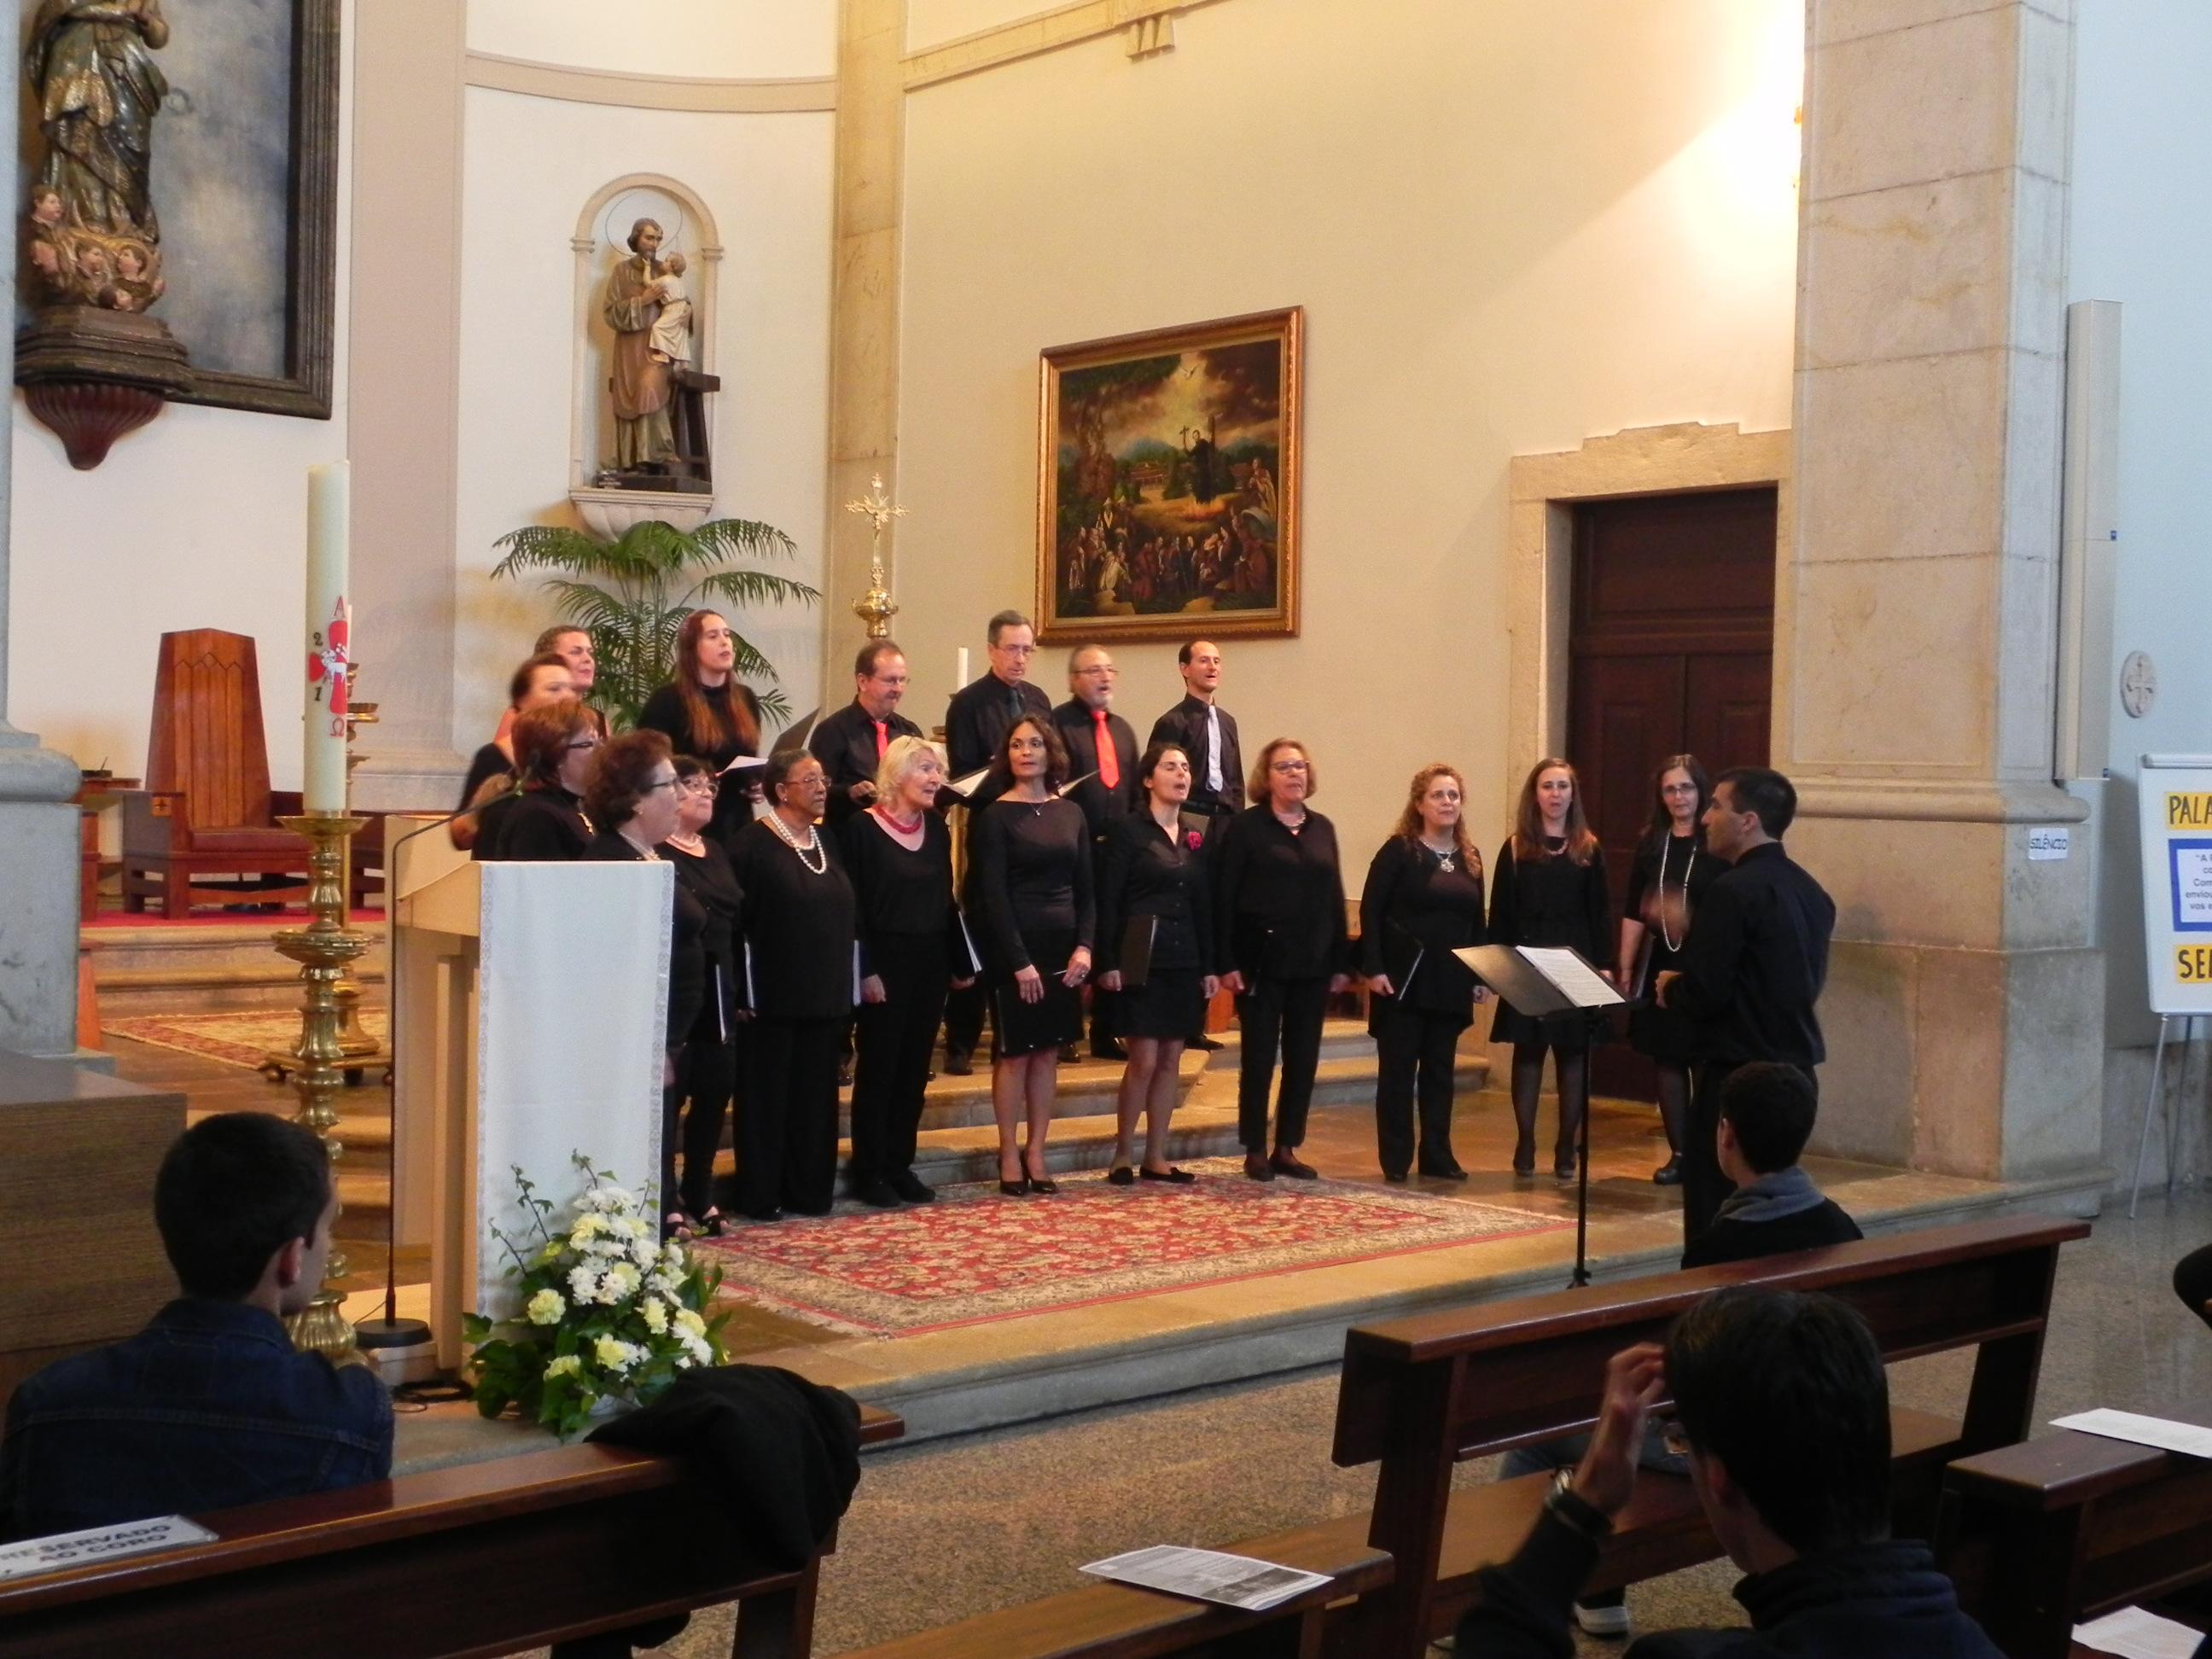 Encontro de Coros 30 de abril na Igreja Matriz